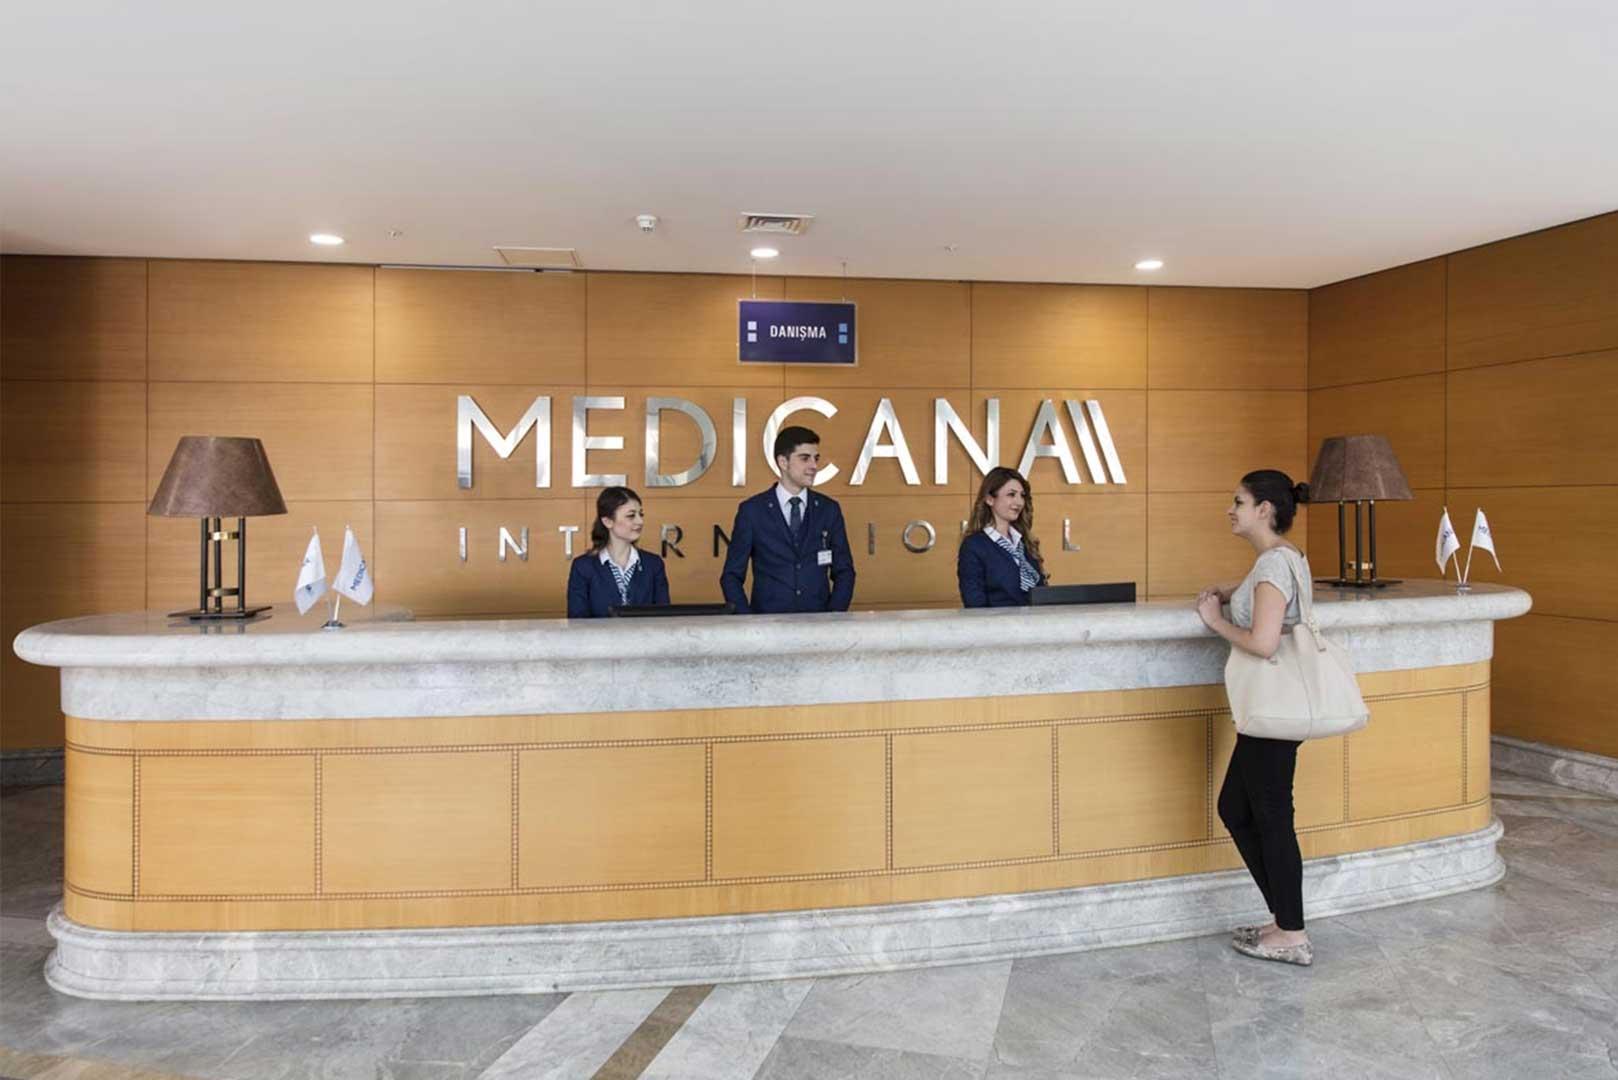 https://www.medicanahealthpoint.com/wp-content/uploads/2020/10/medicana-international-istanbul-8.jpg